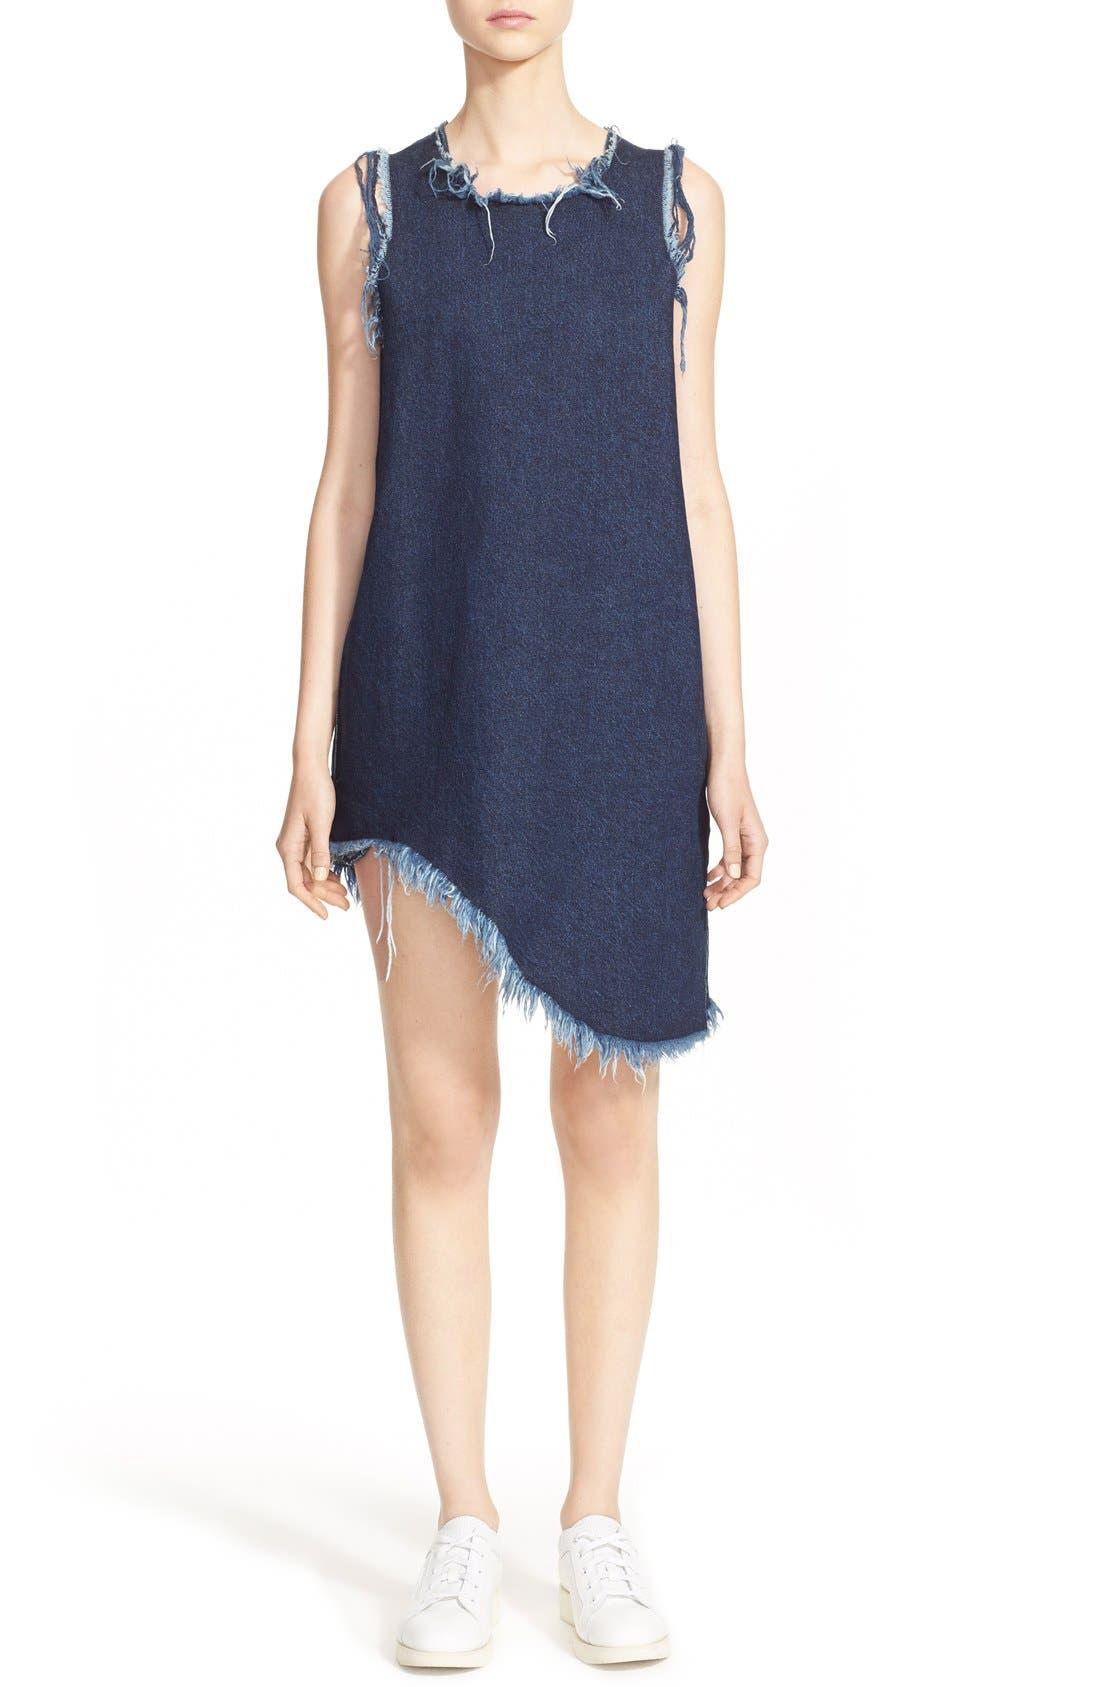 MARQUES'ALMEIDA Marques'Almeida Asymmetrical Denim Shift Dress, Main, color, 401